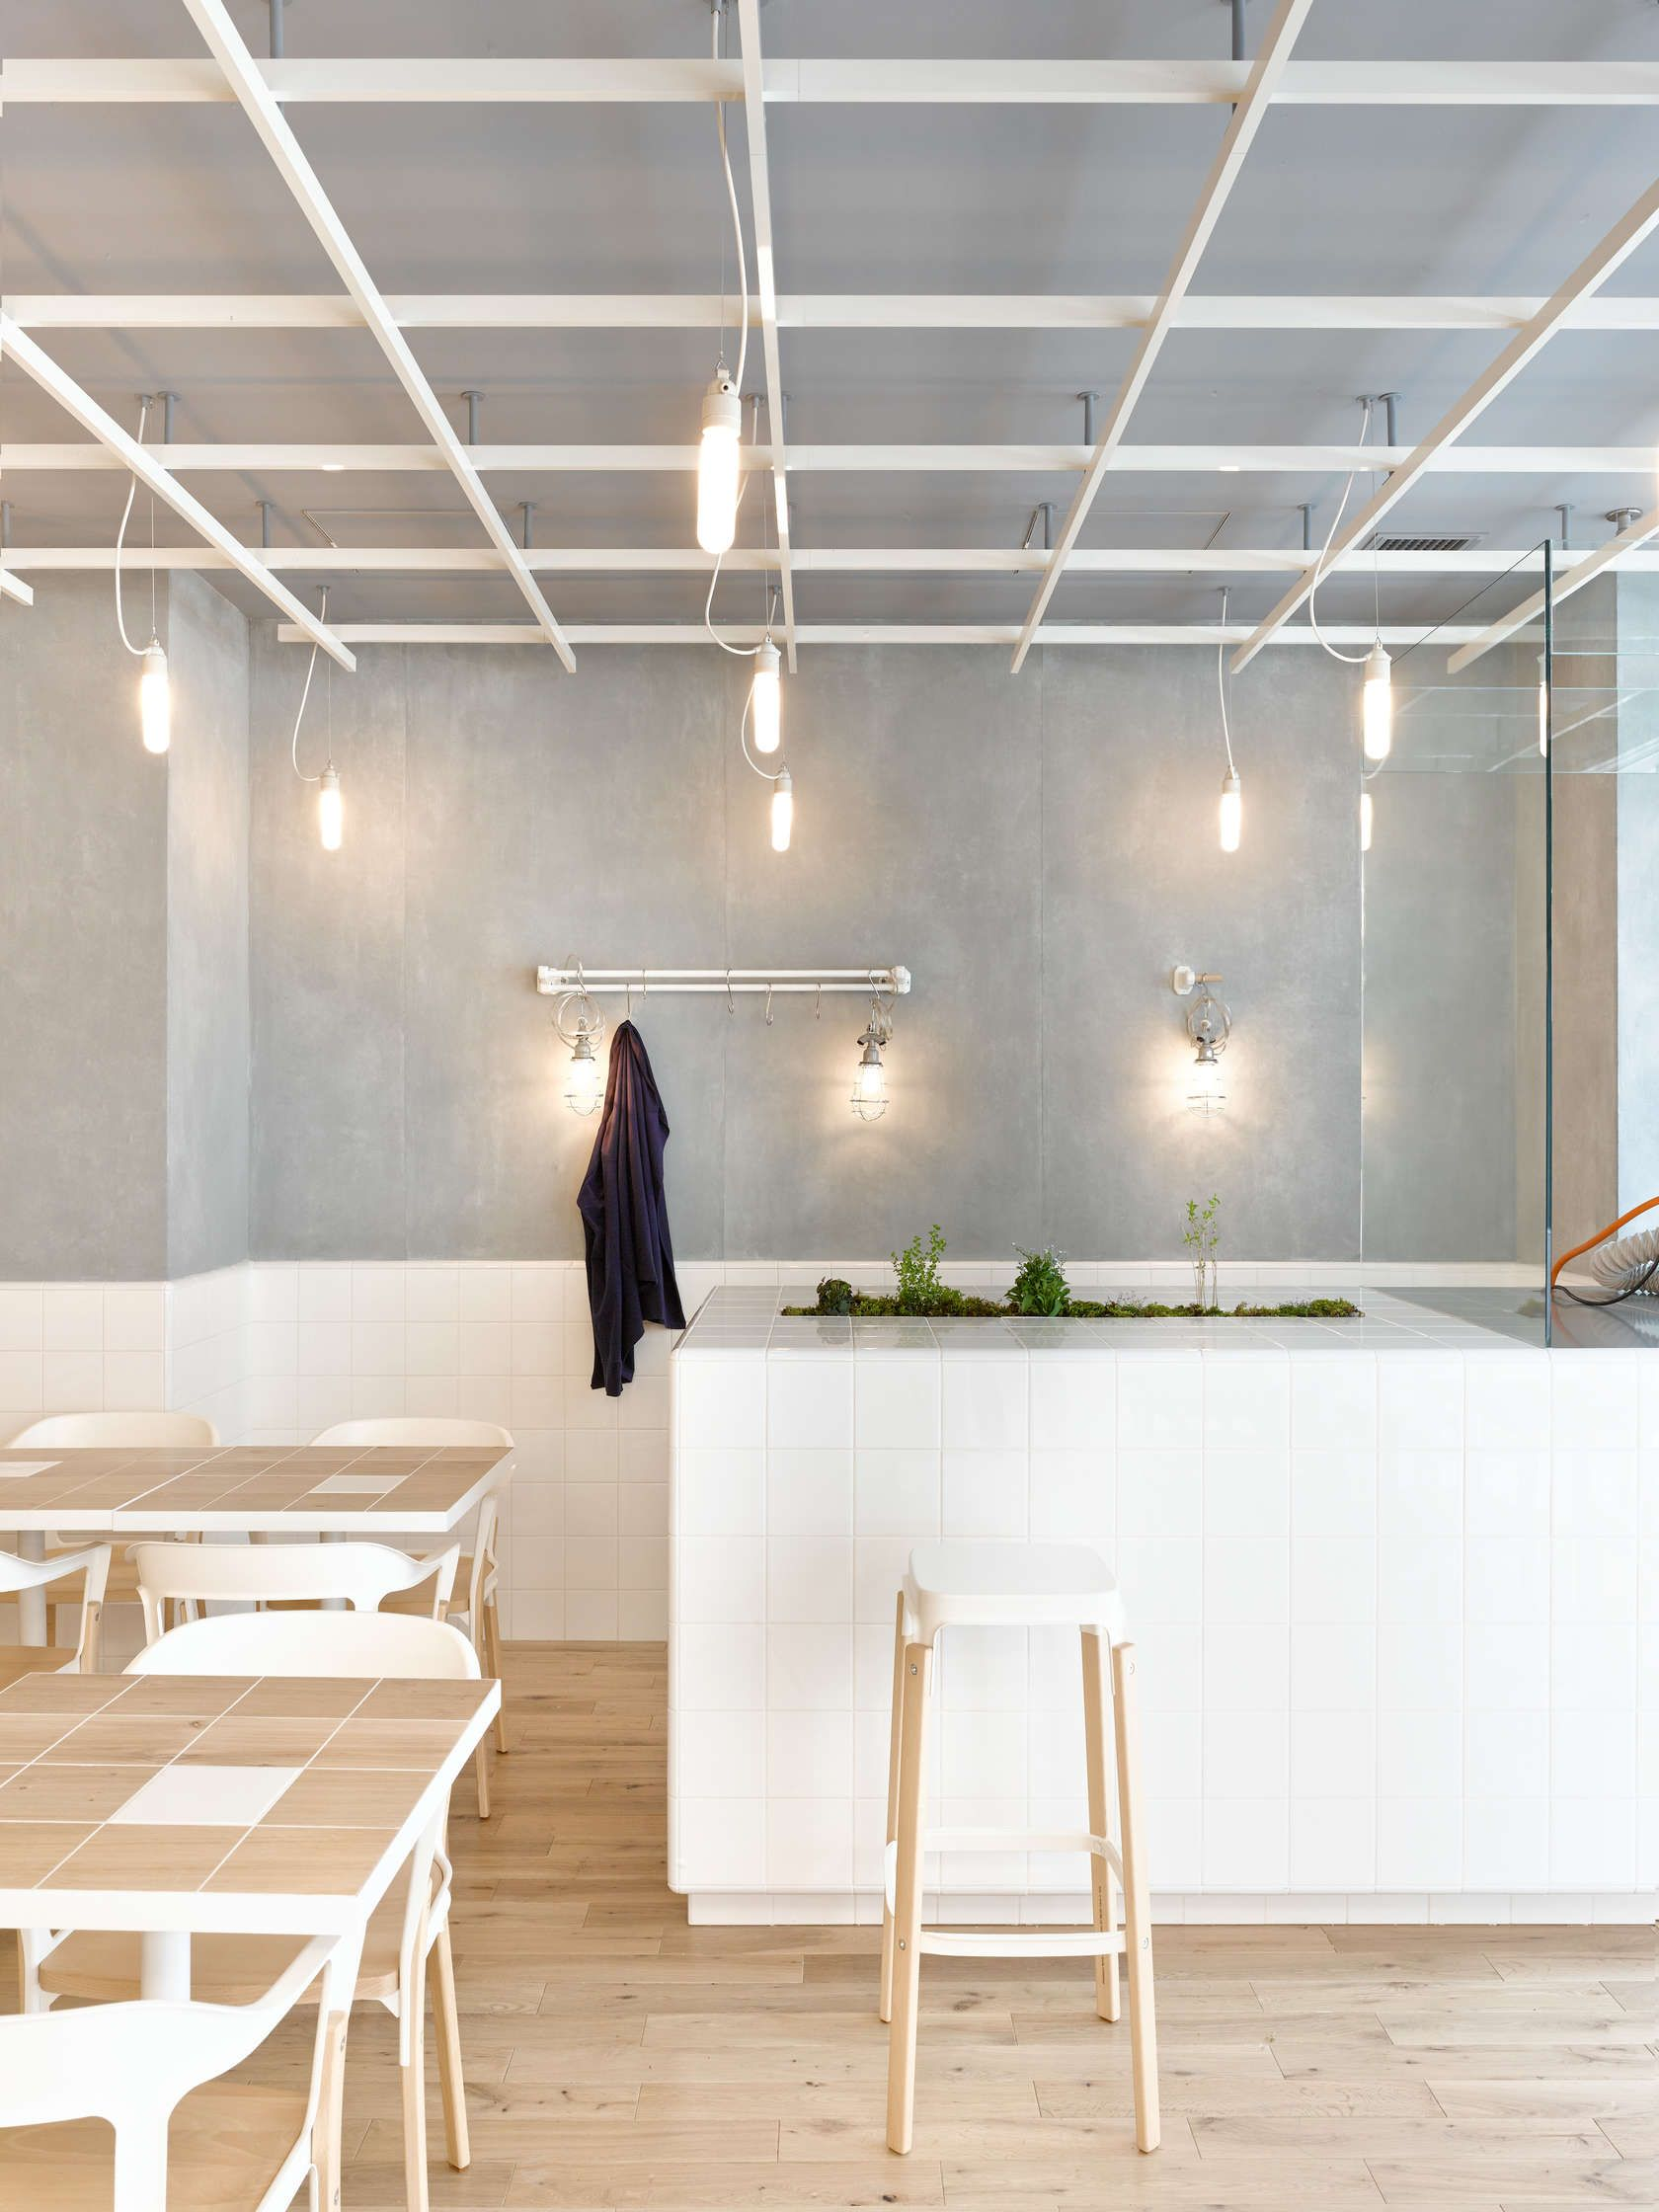 Laboratory Inspired Minimalist Coffee Bar Cafe Interior Minimalist Furniture Wood Cafe